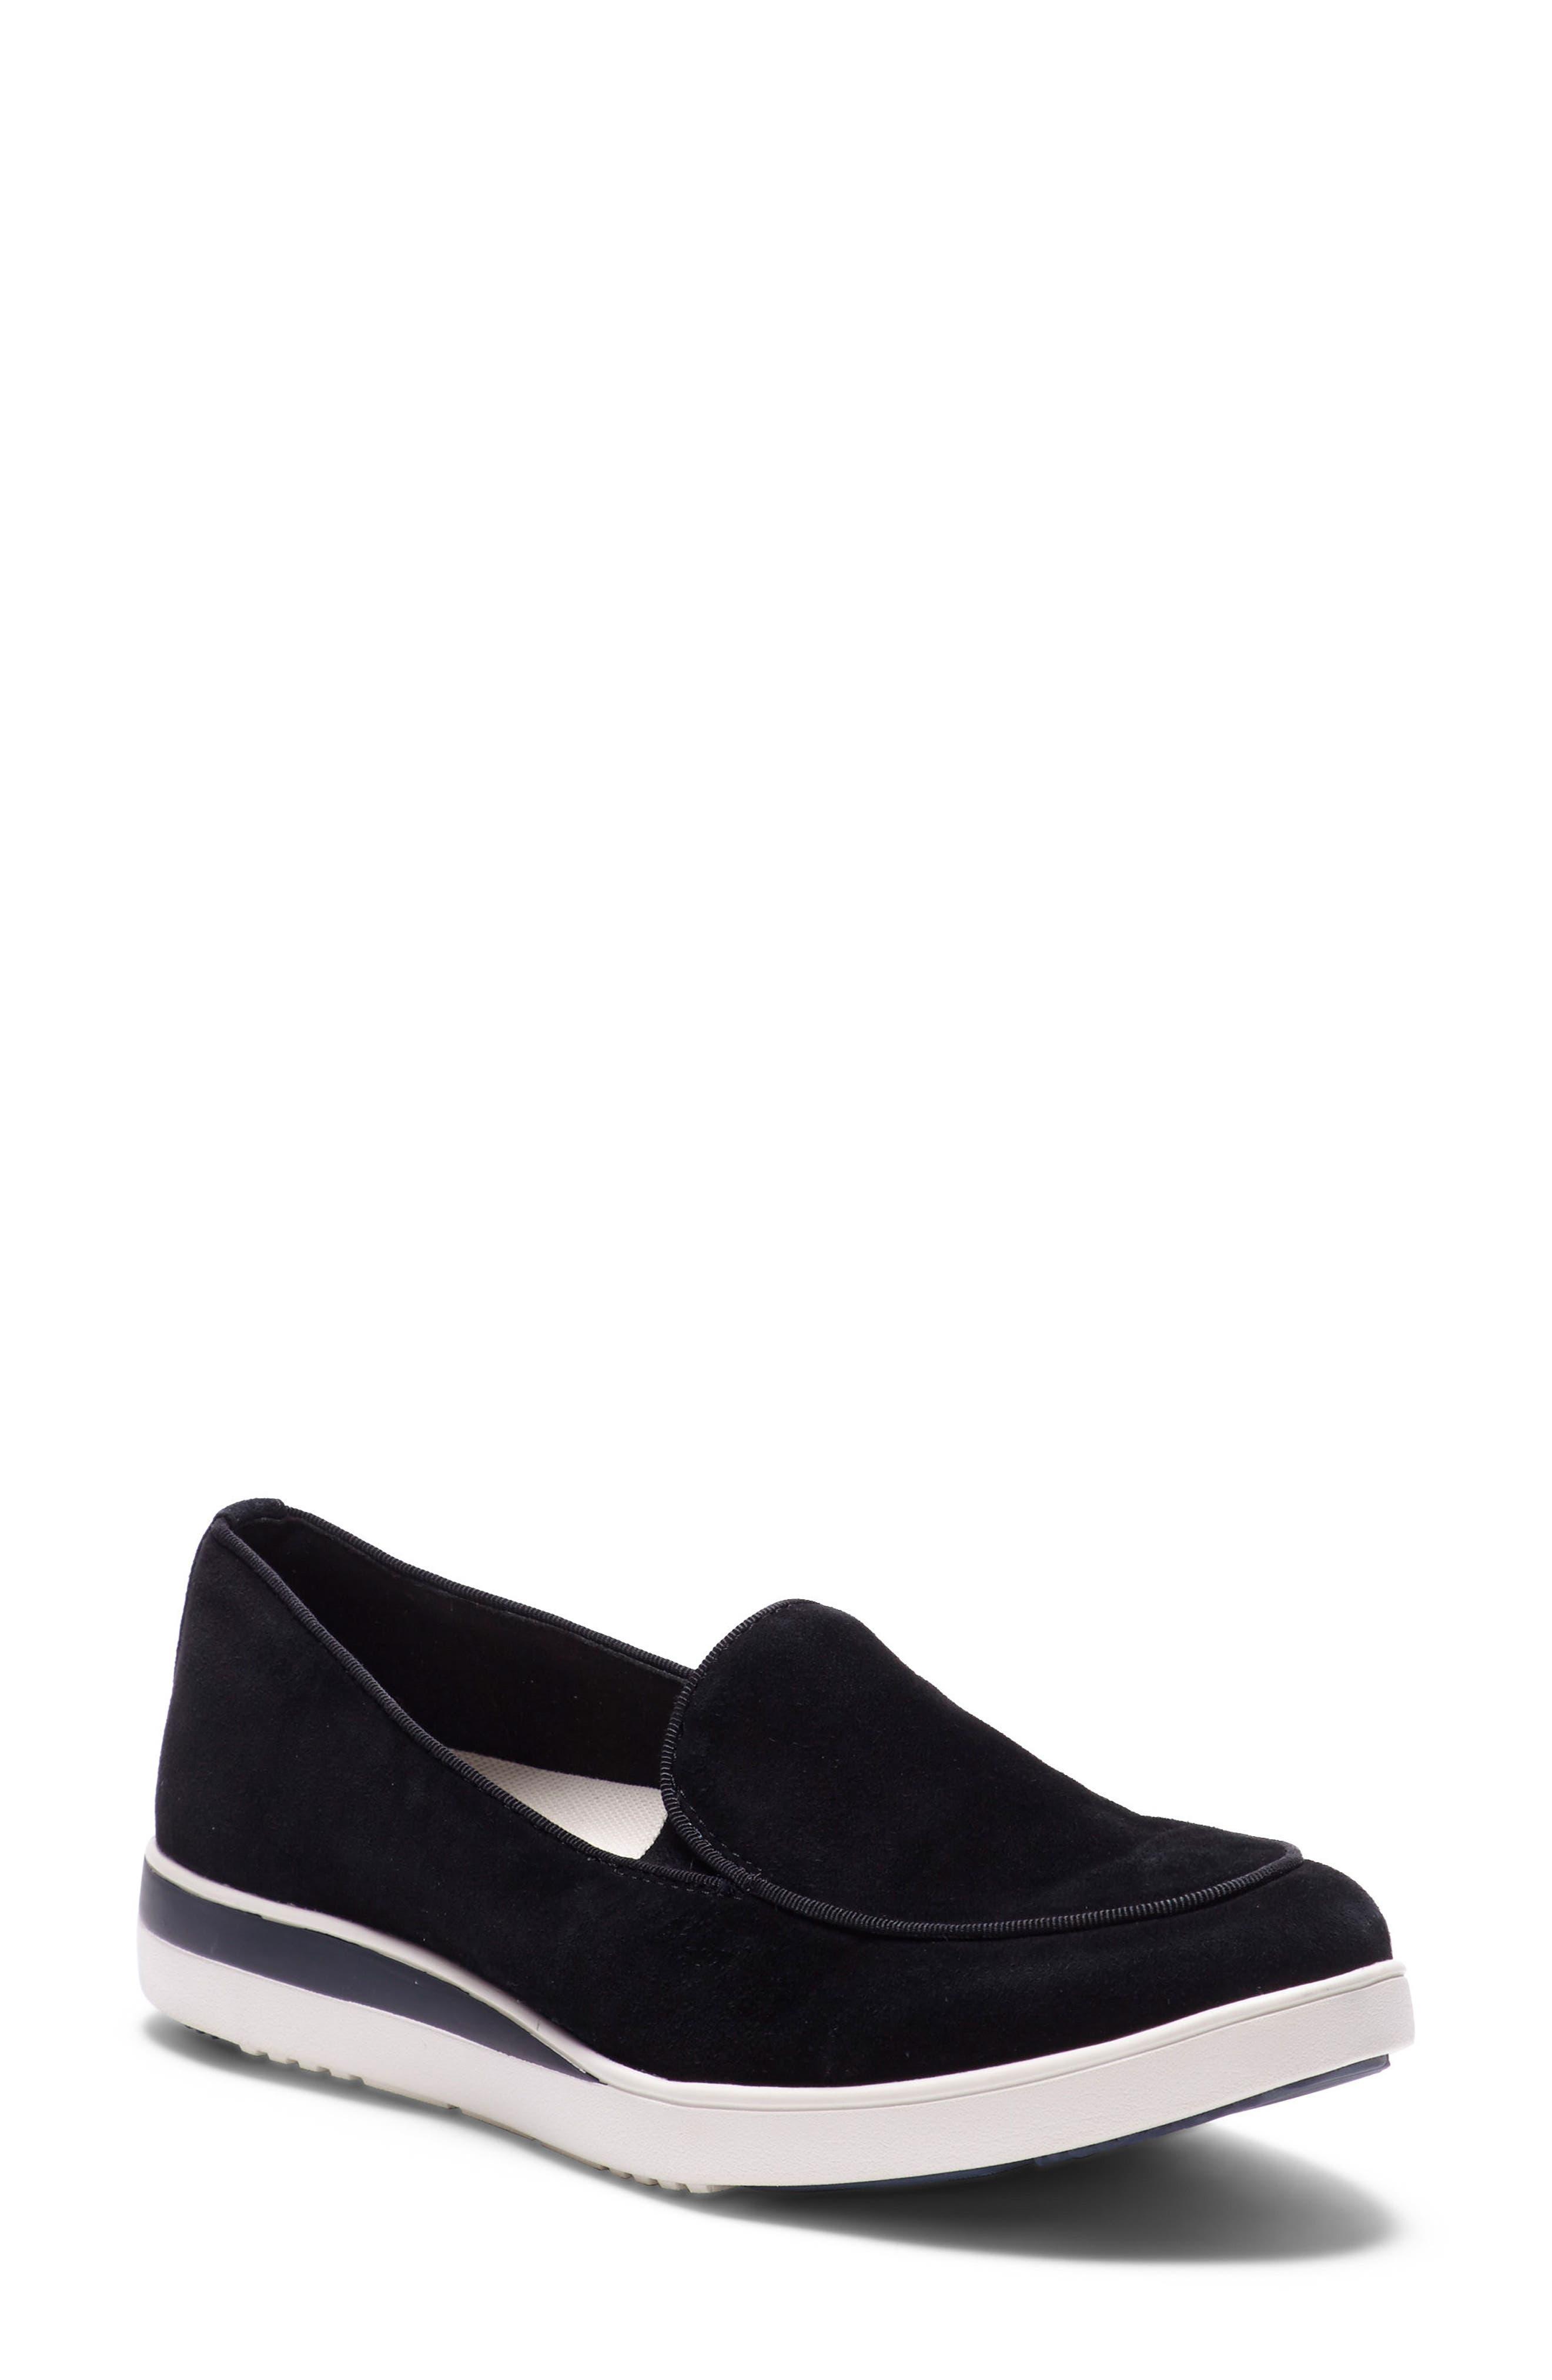 Antona Slip-On Sneaker,                             Main thumbnail 1, color,                             002